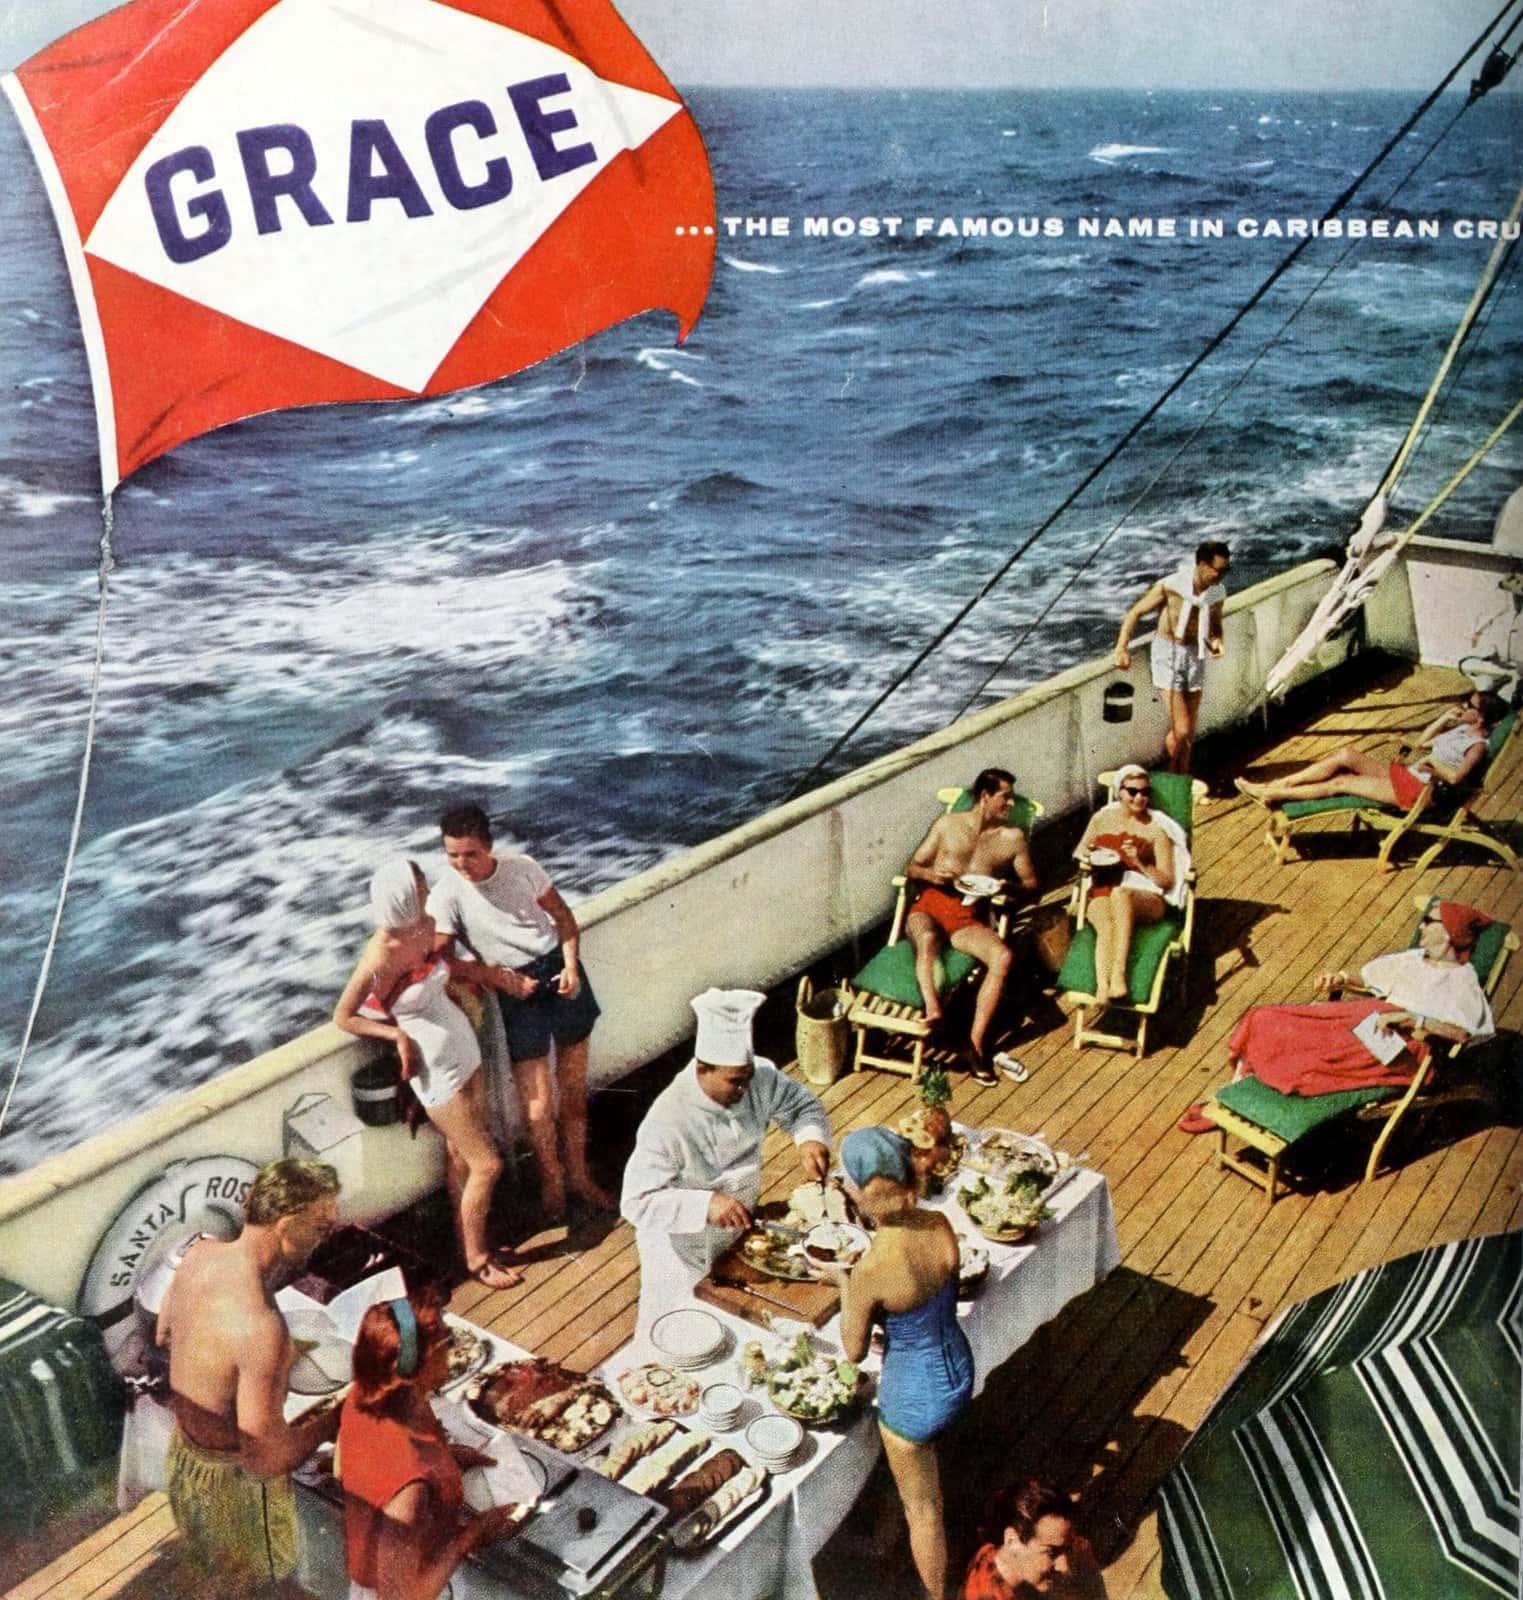 Grace cruise ship line 1950s